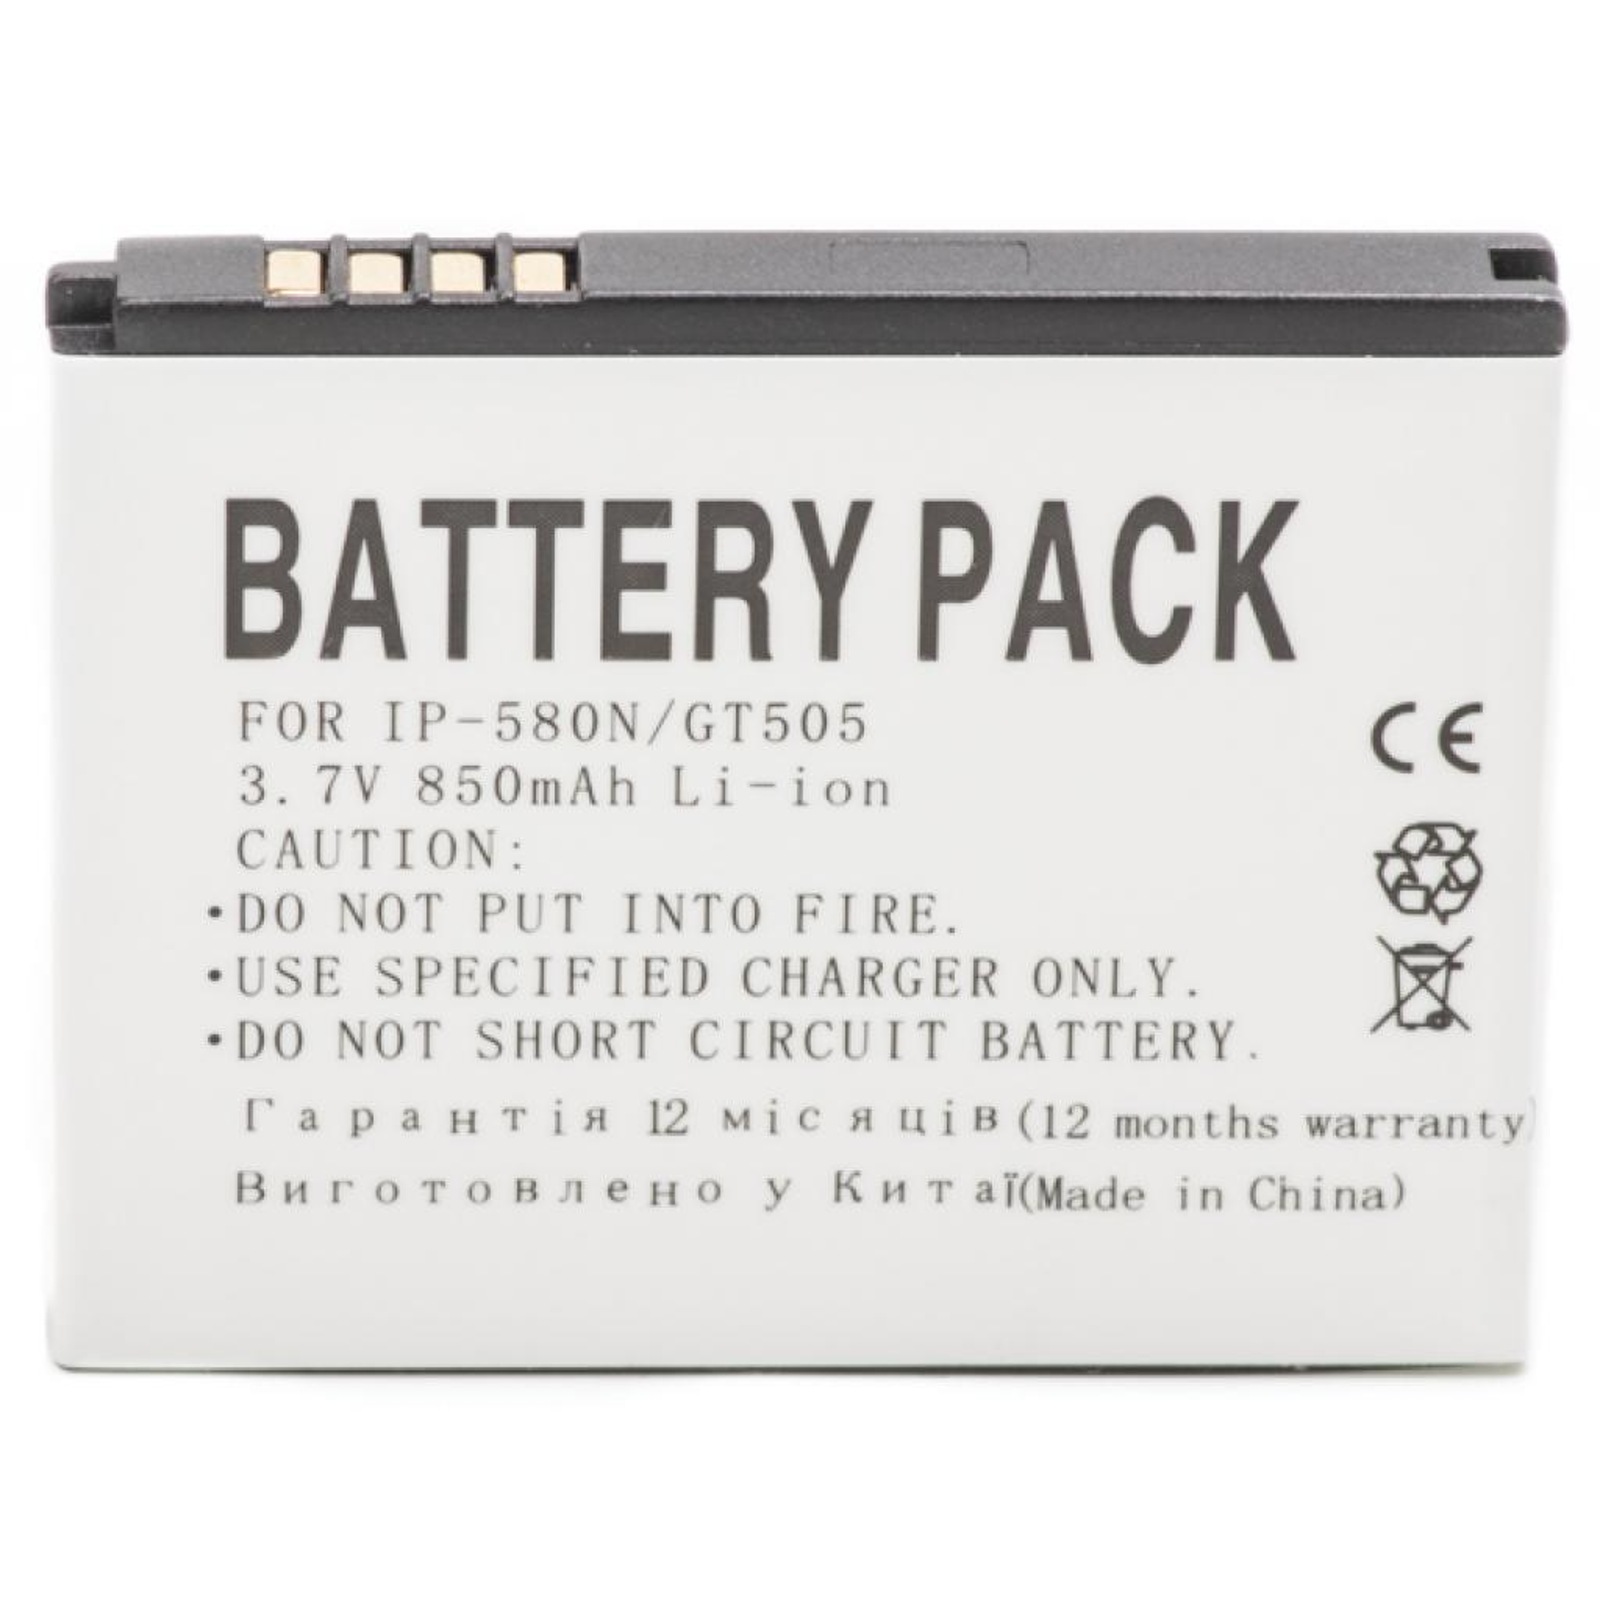 Аккумуляторная батарея PowerPlant LG IP-580N (GC900, GC900e, GW525, GT505, GT400) (DV00DV6093) изображение 2